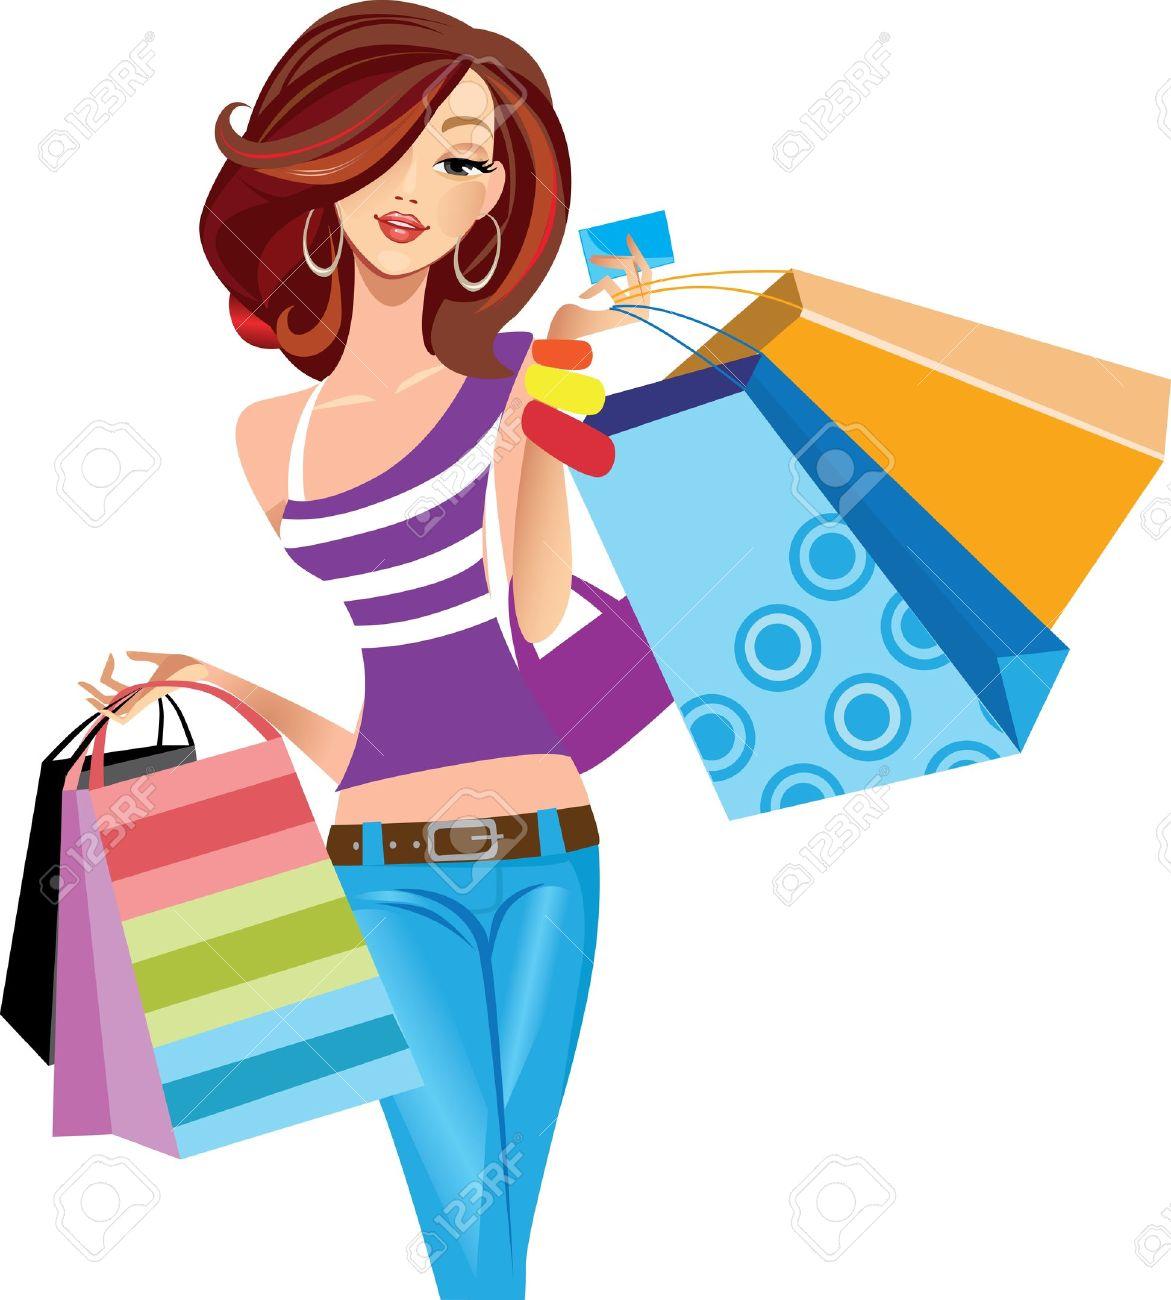 Girl Shopping Clipart.